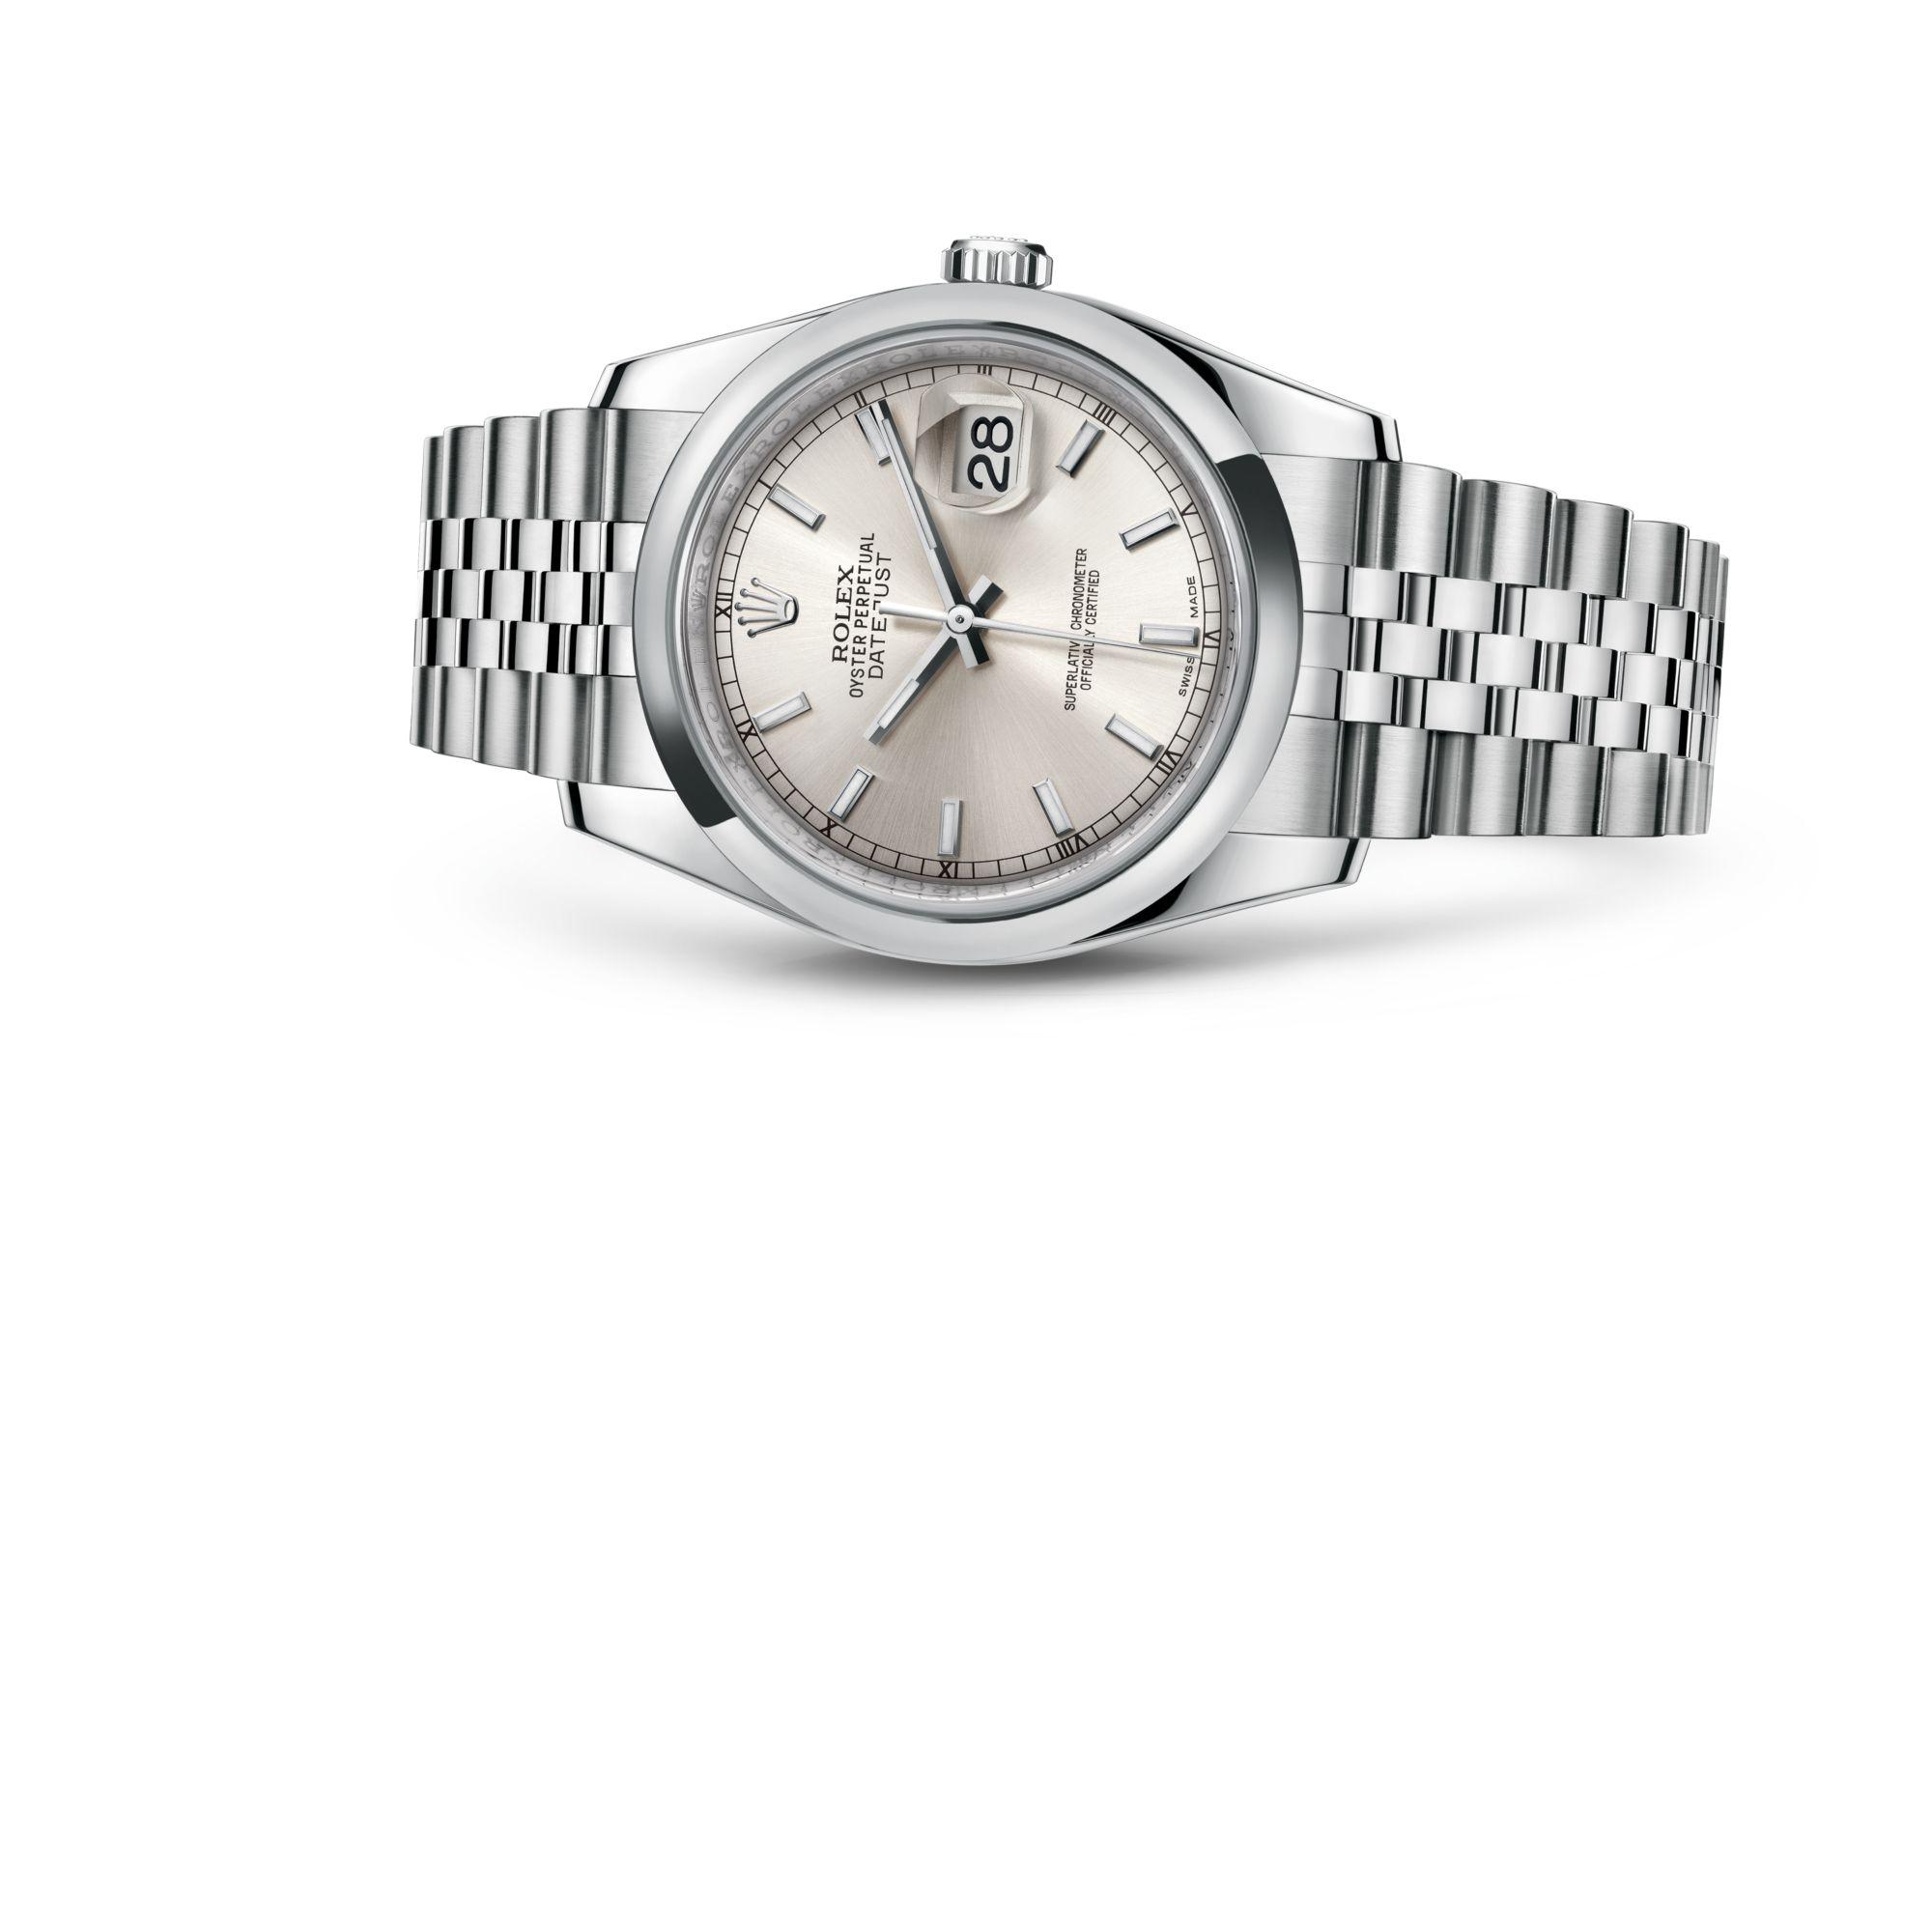 Rolex ديت جست ۳٦ M116200-0084